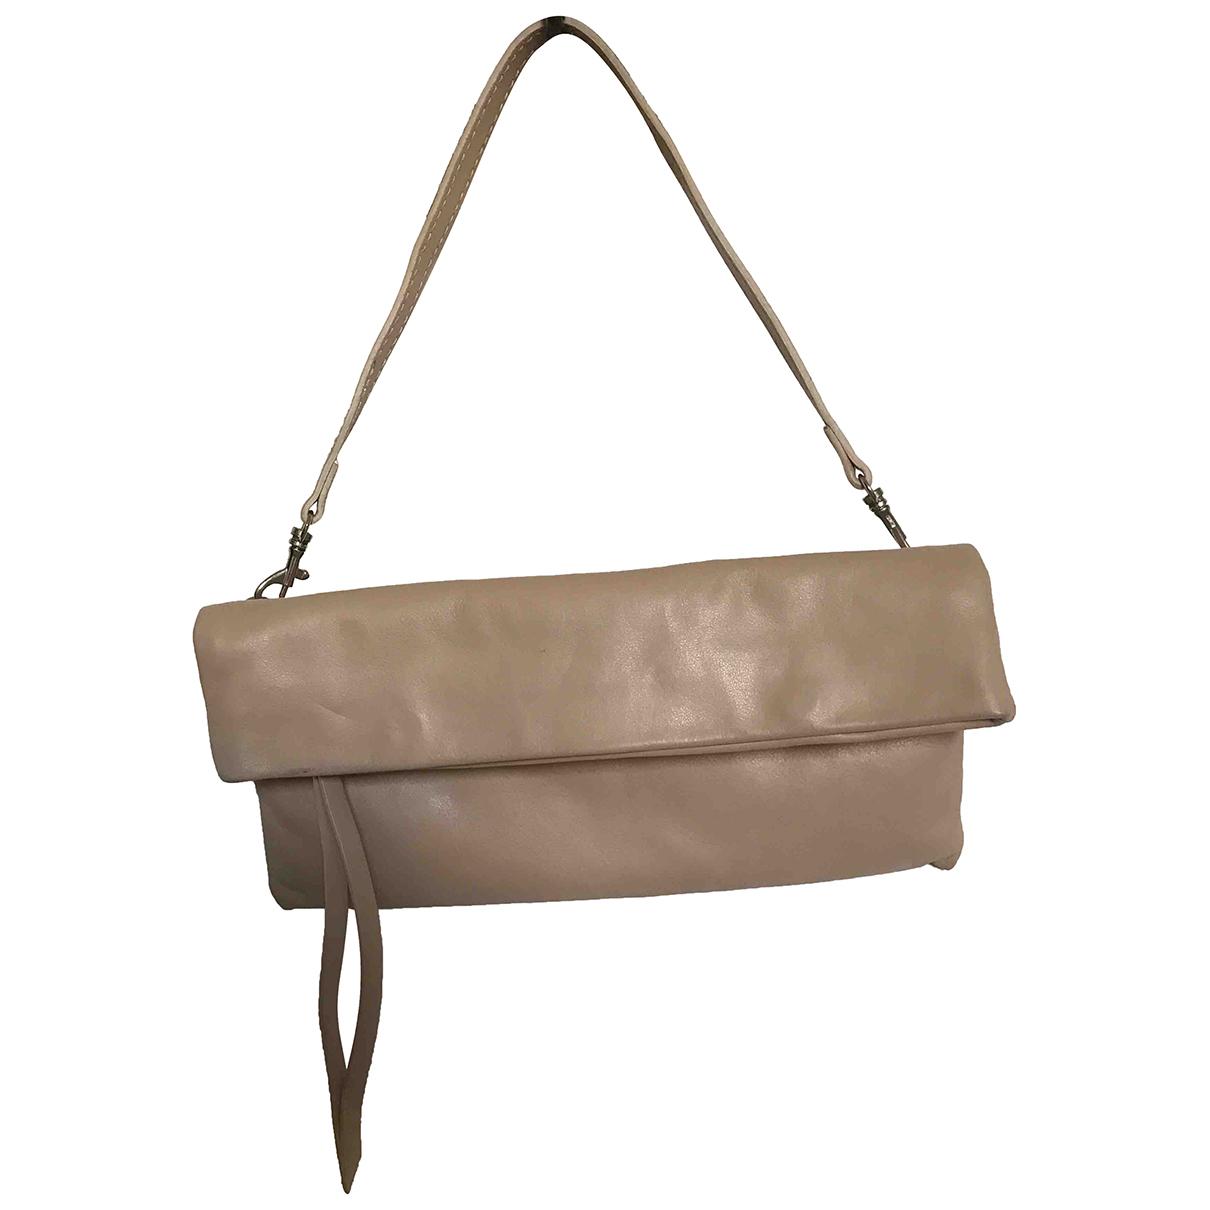 Gianni Chiarini \N Pink Leather Clutch bag for Women \N